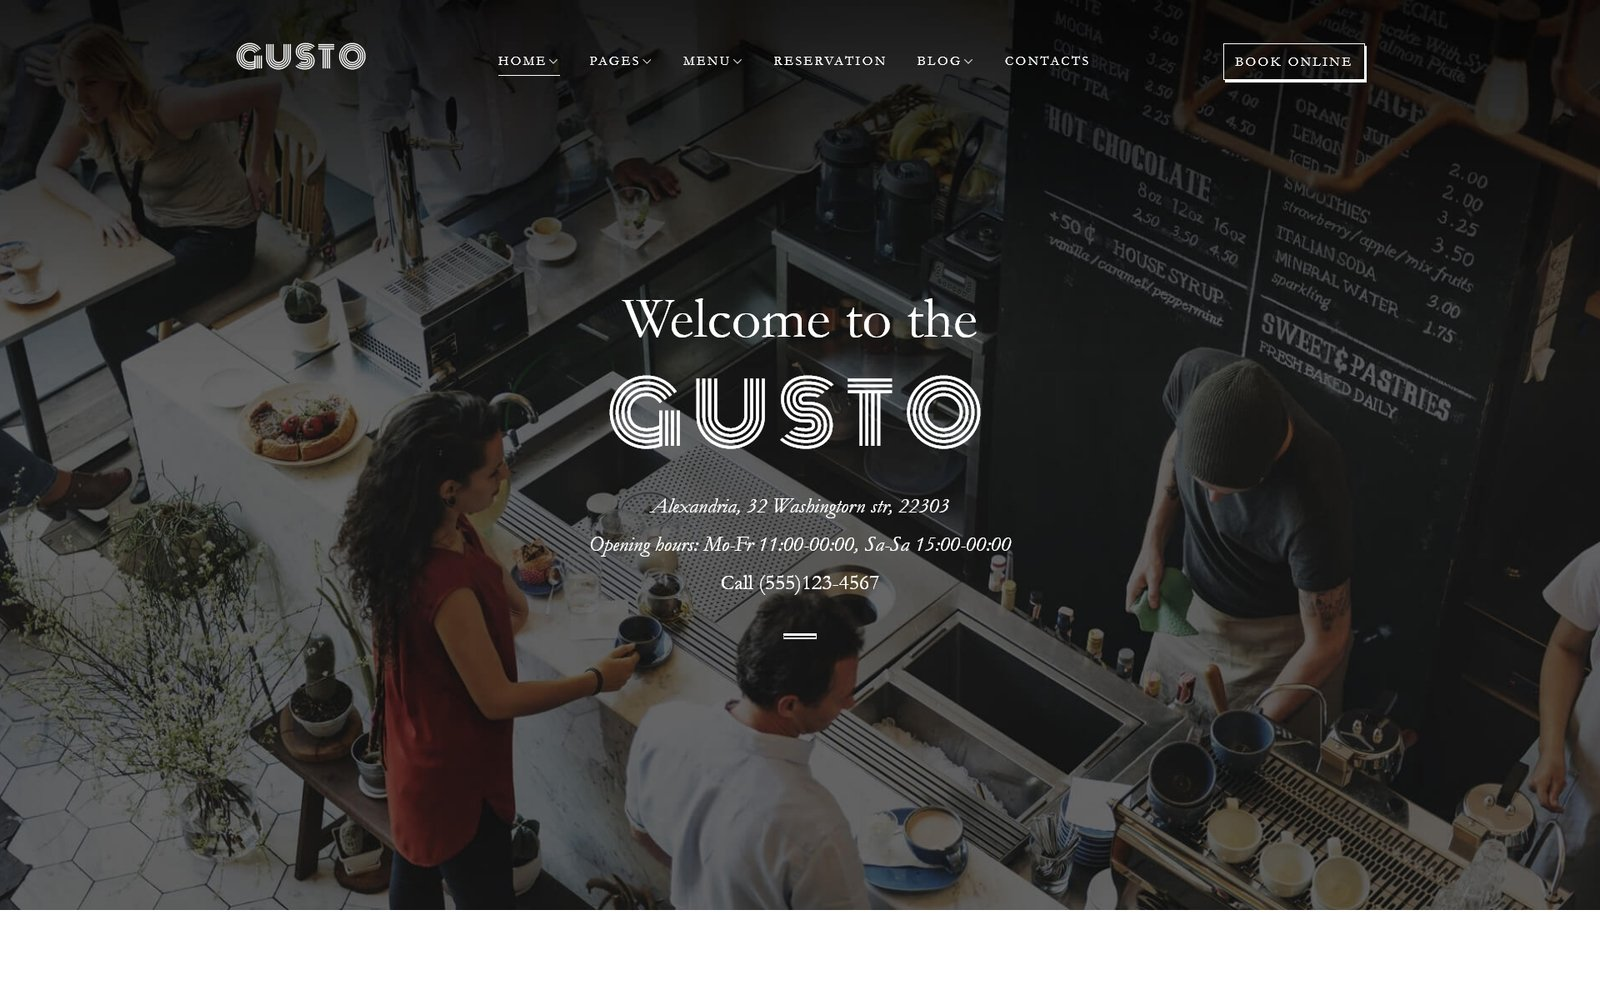 Gusto - Cafe & Restaurant WordPress Theme - screenshot